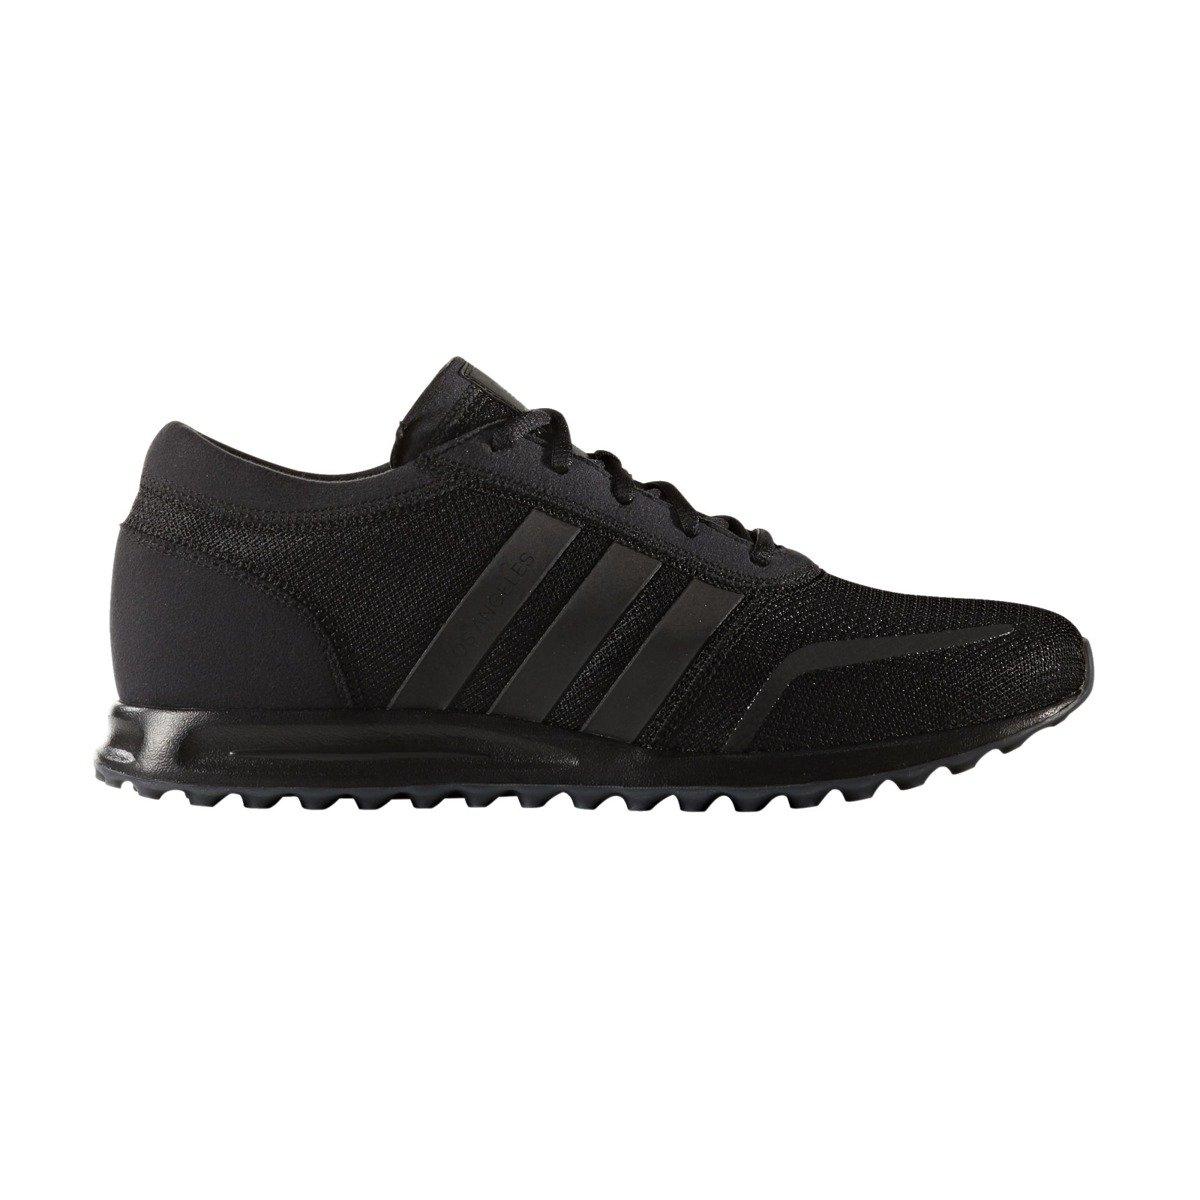 adidas los angeles shoes bb1125 basketball shoes. Black Bedroom Furniture Sets. Home Design Ideas